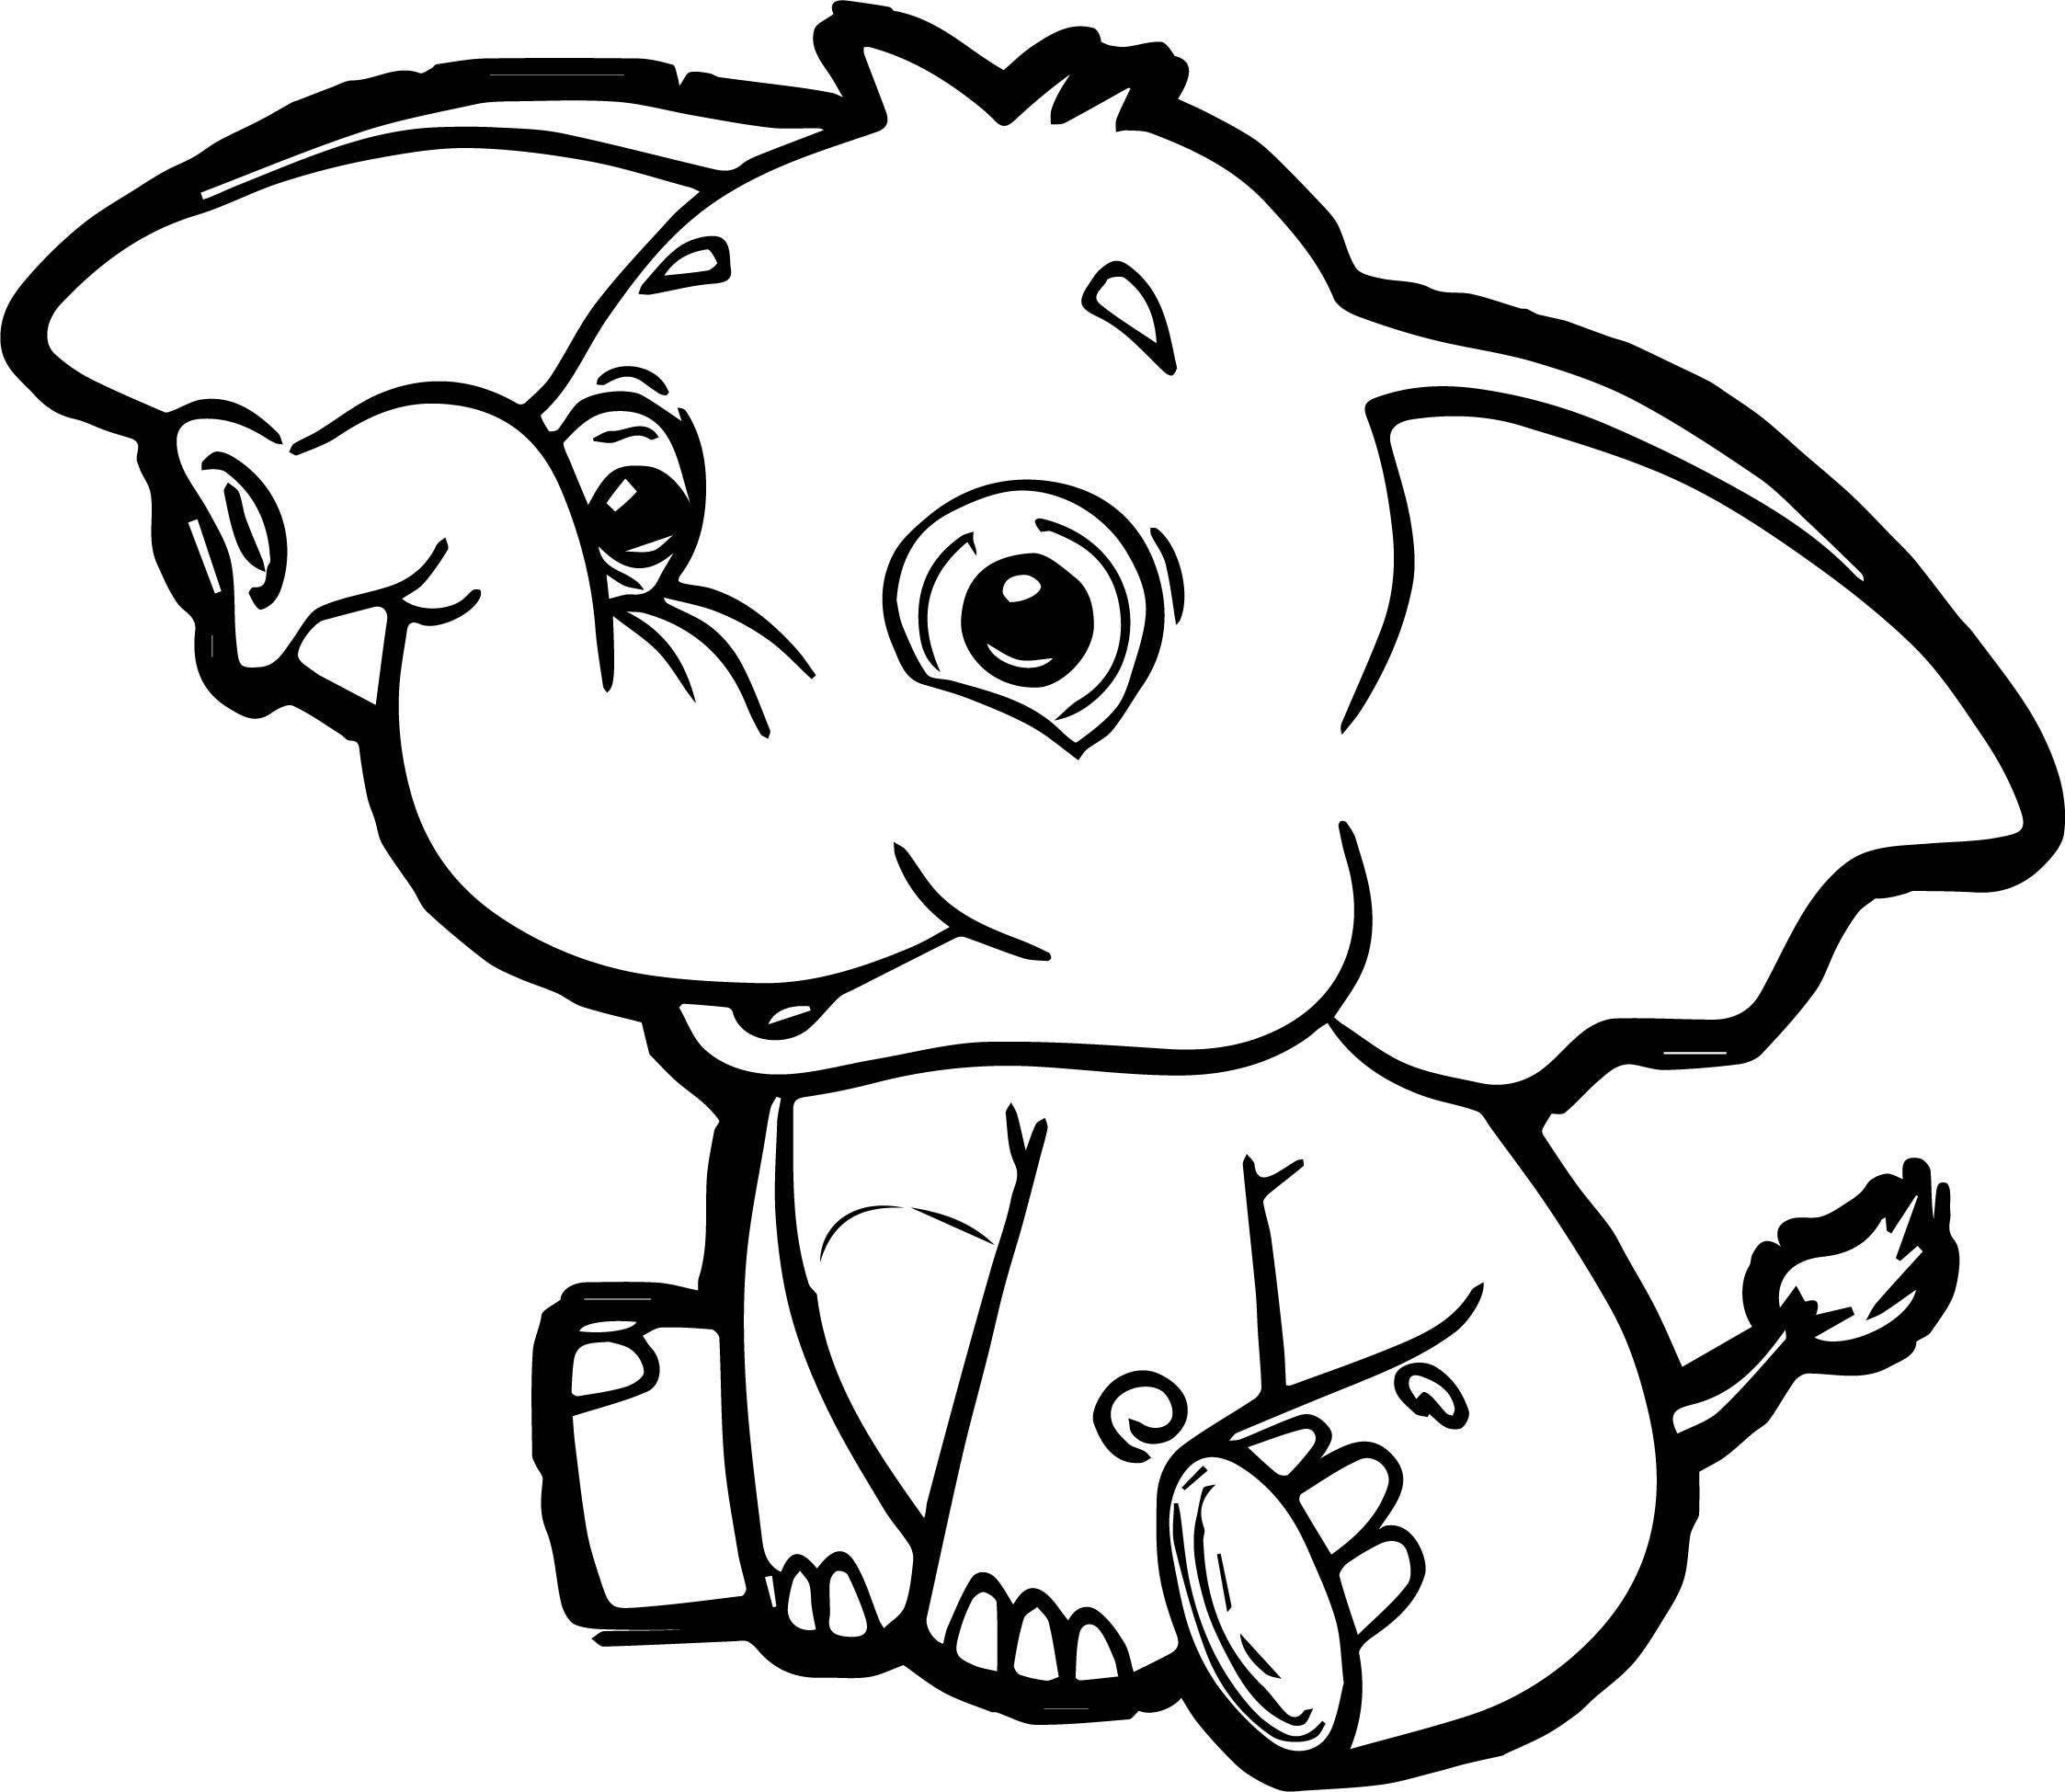 Dinosaur Elephant Coloring Page | Wecoloringpage.com